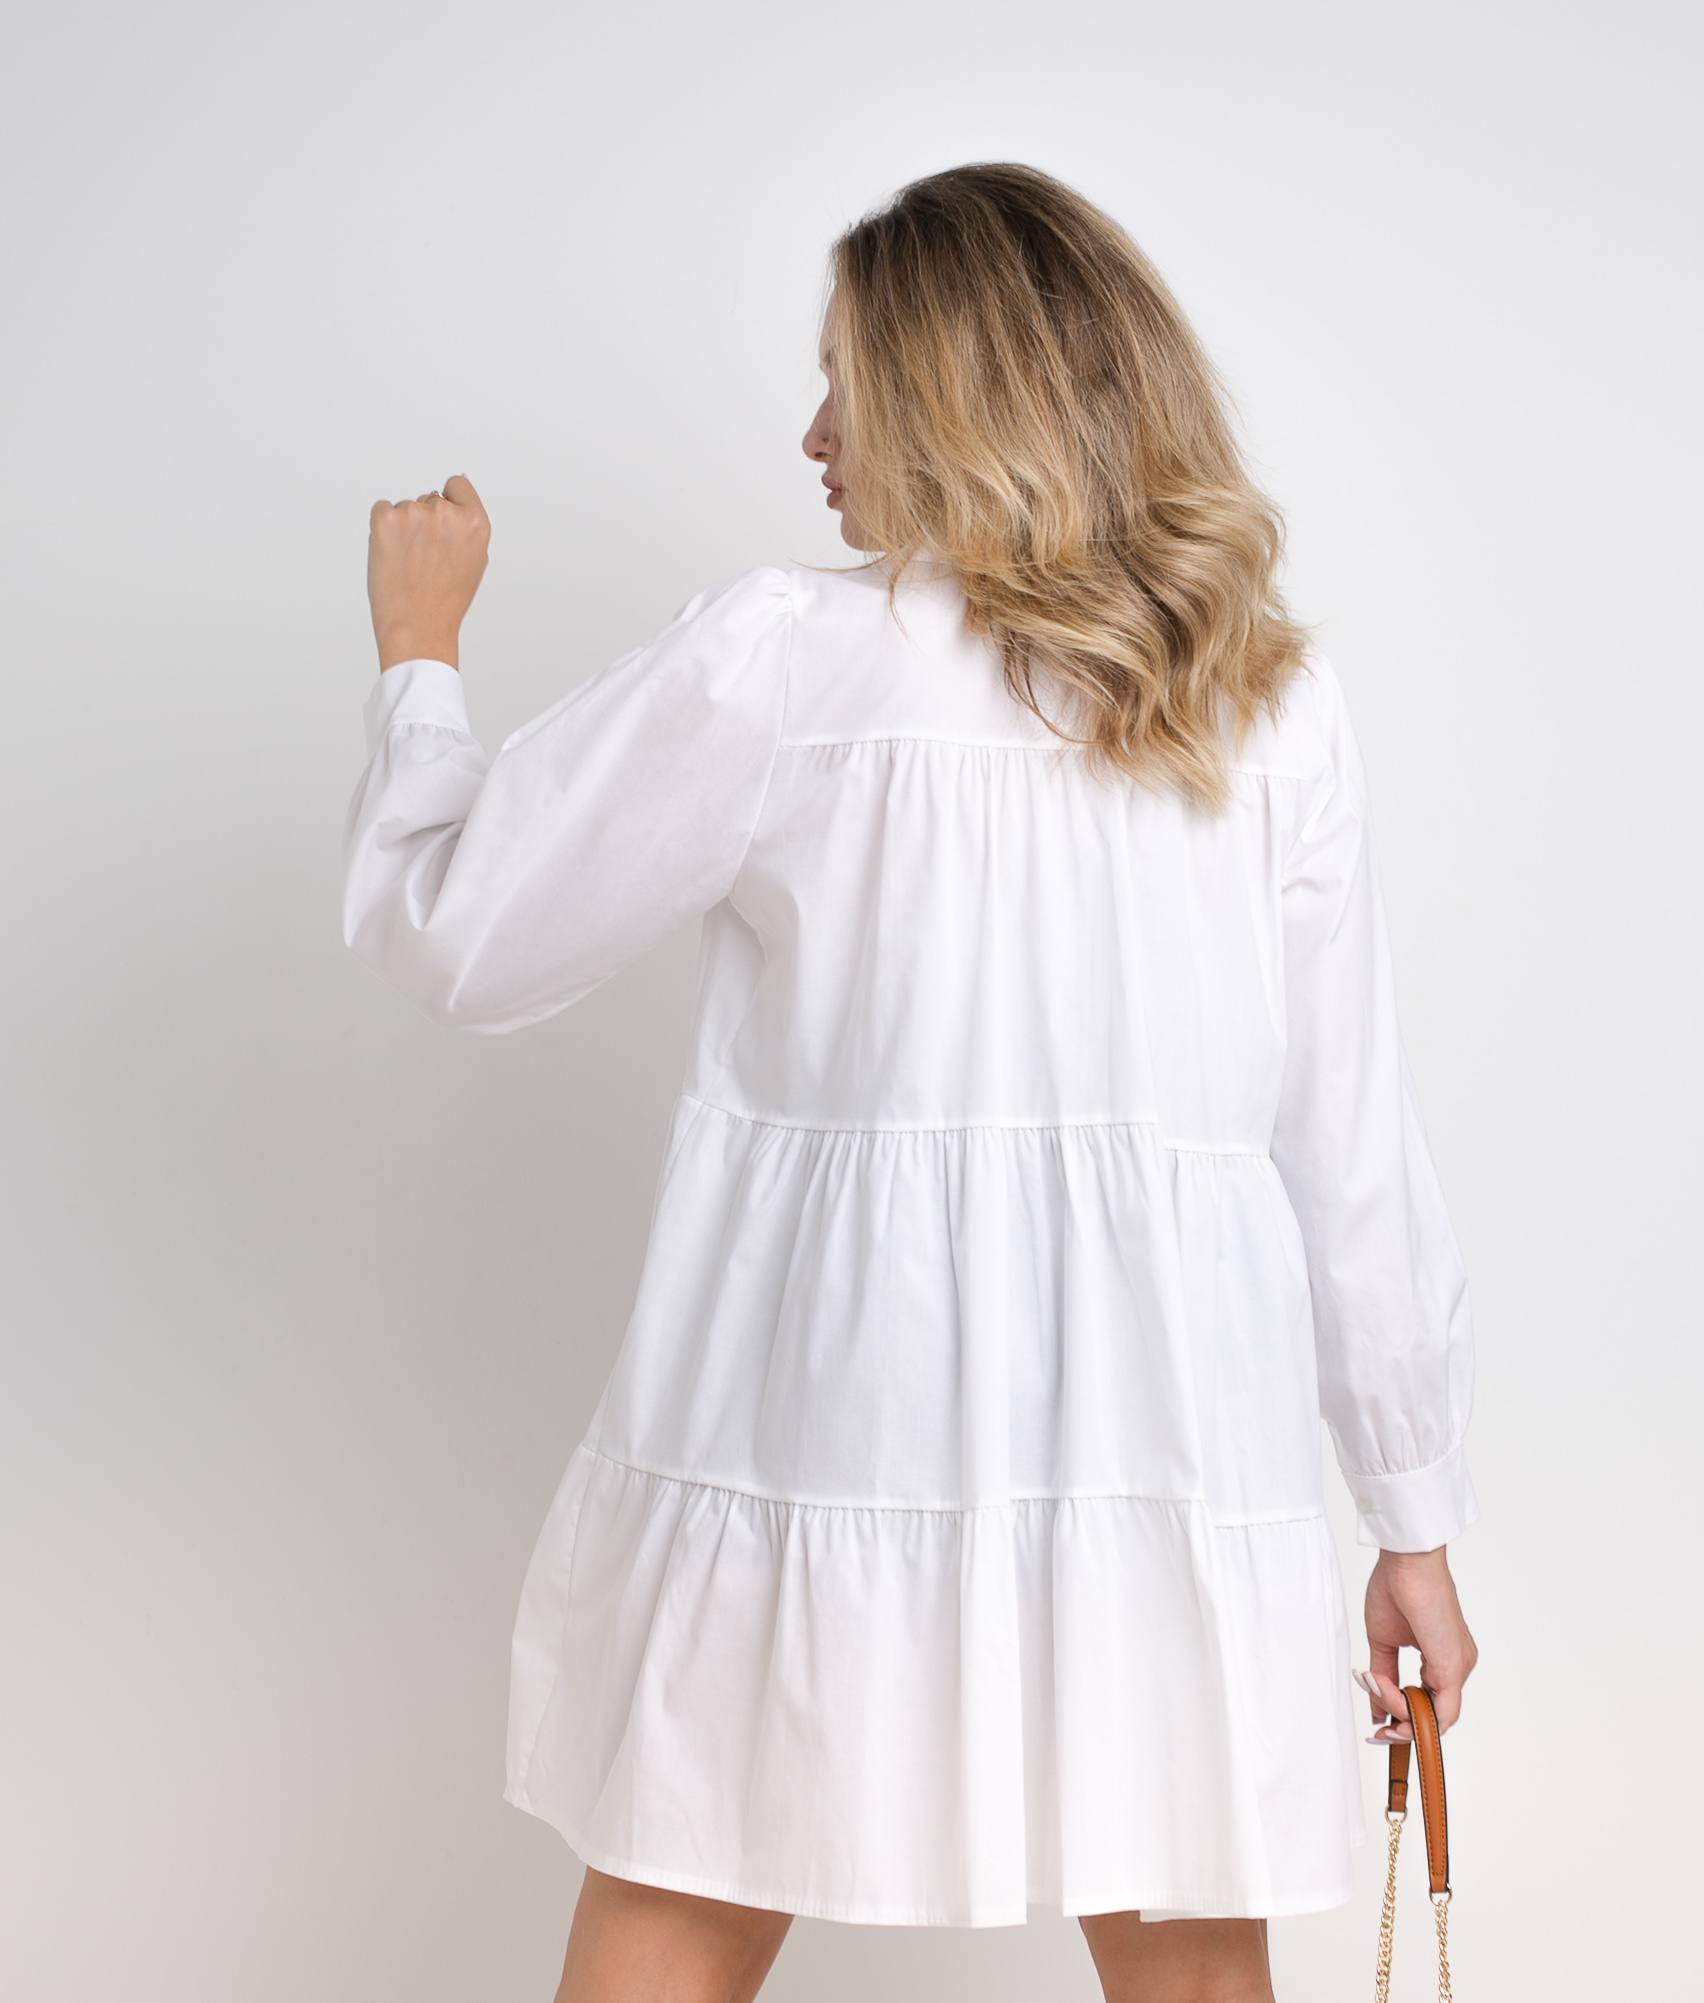 ARCONA DRESS - WHITE